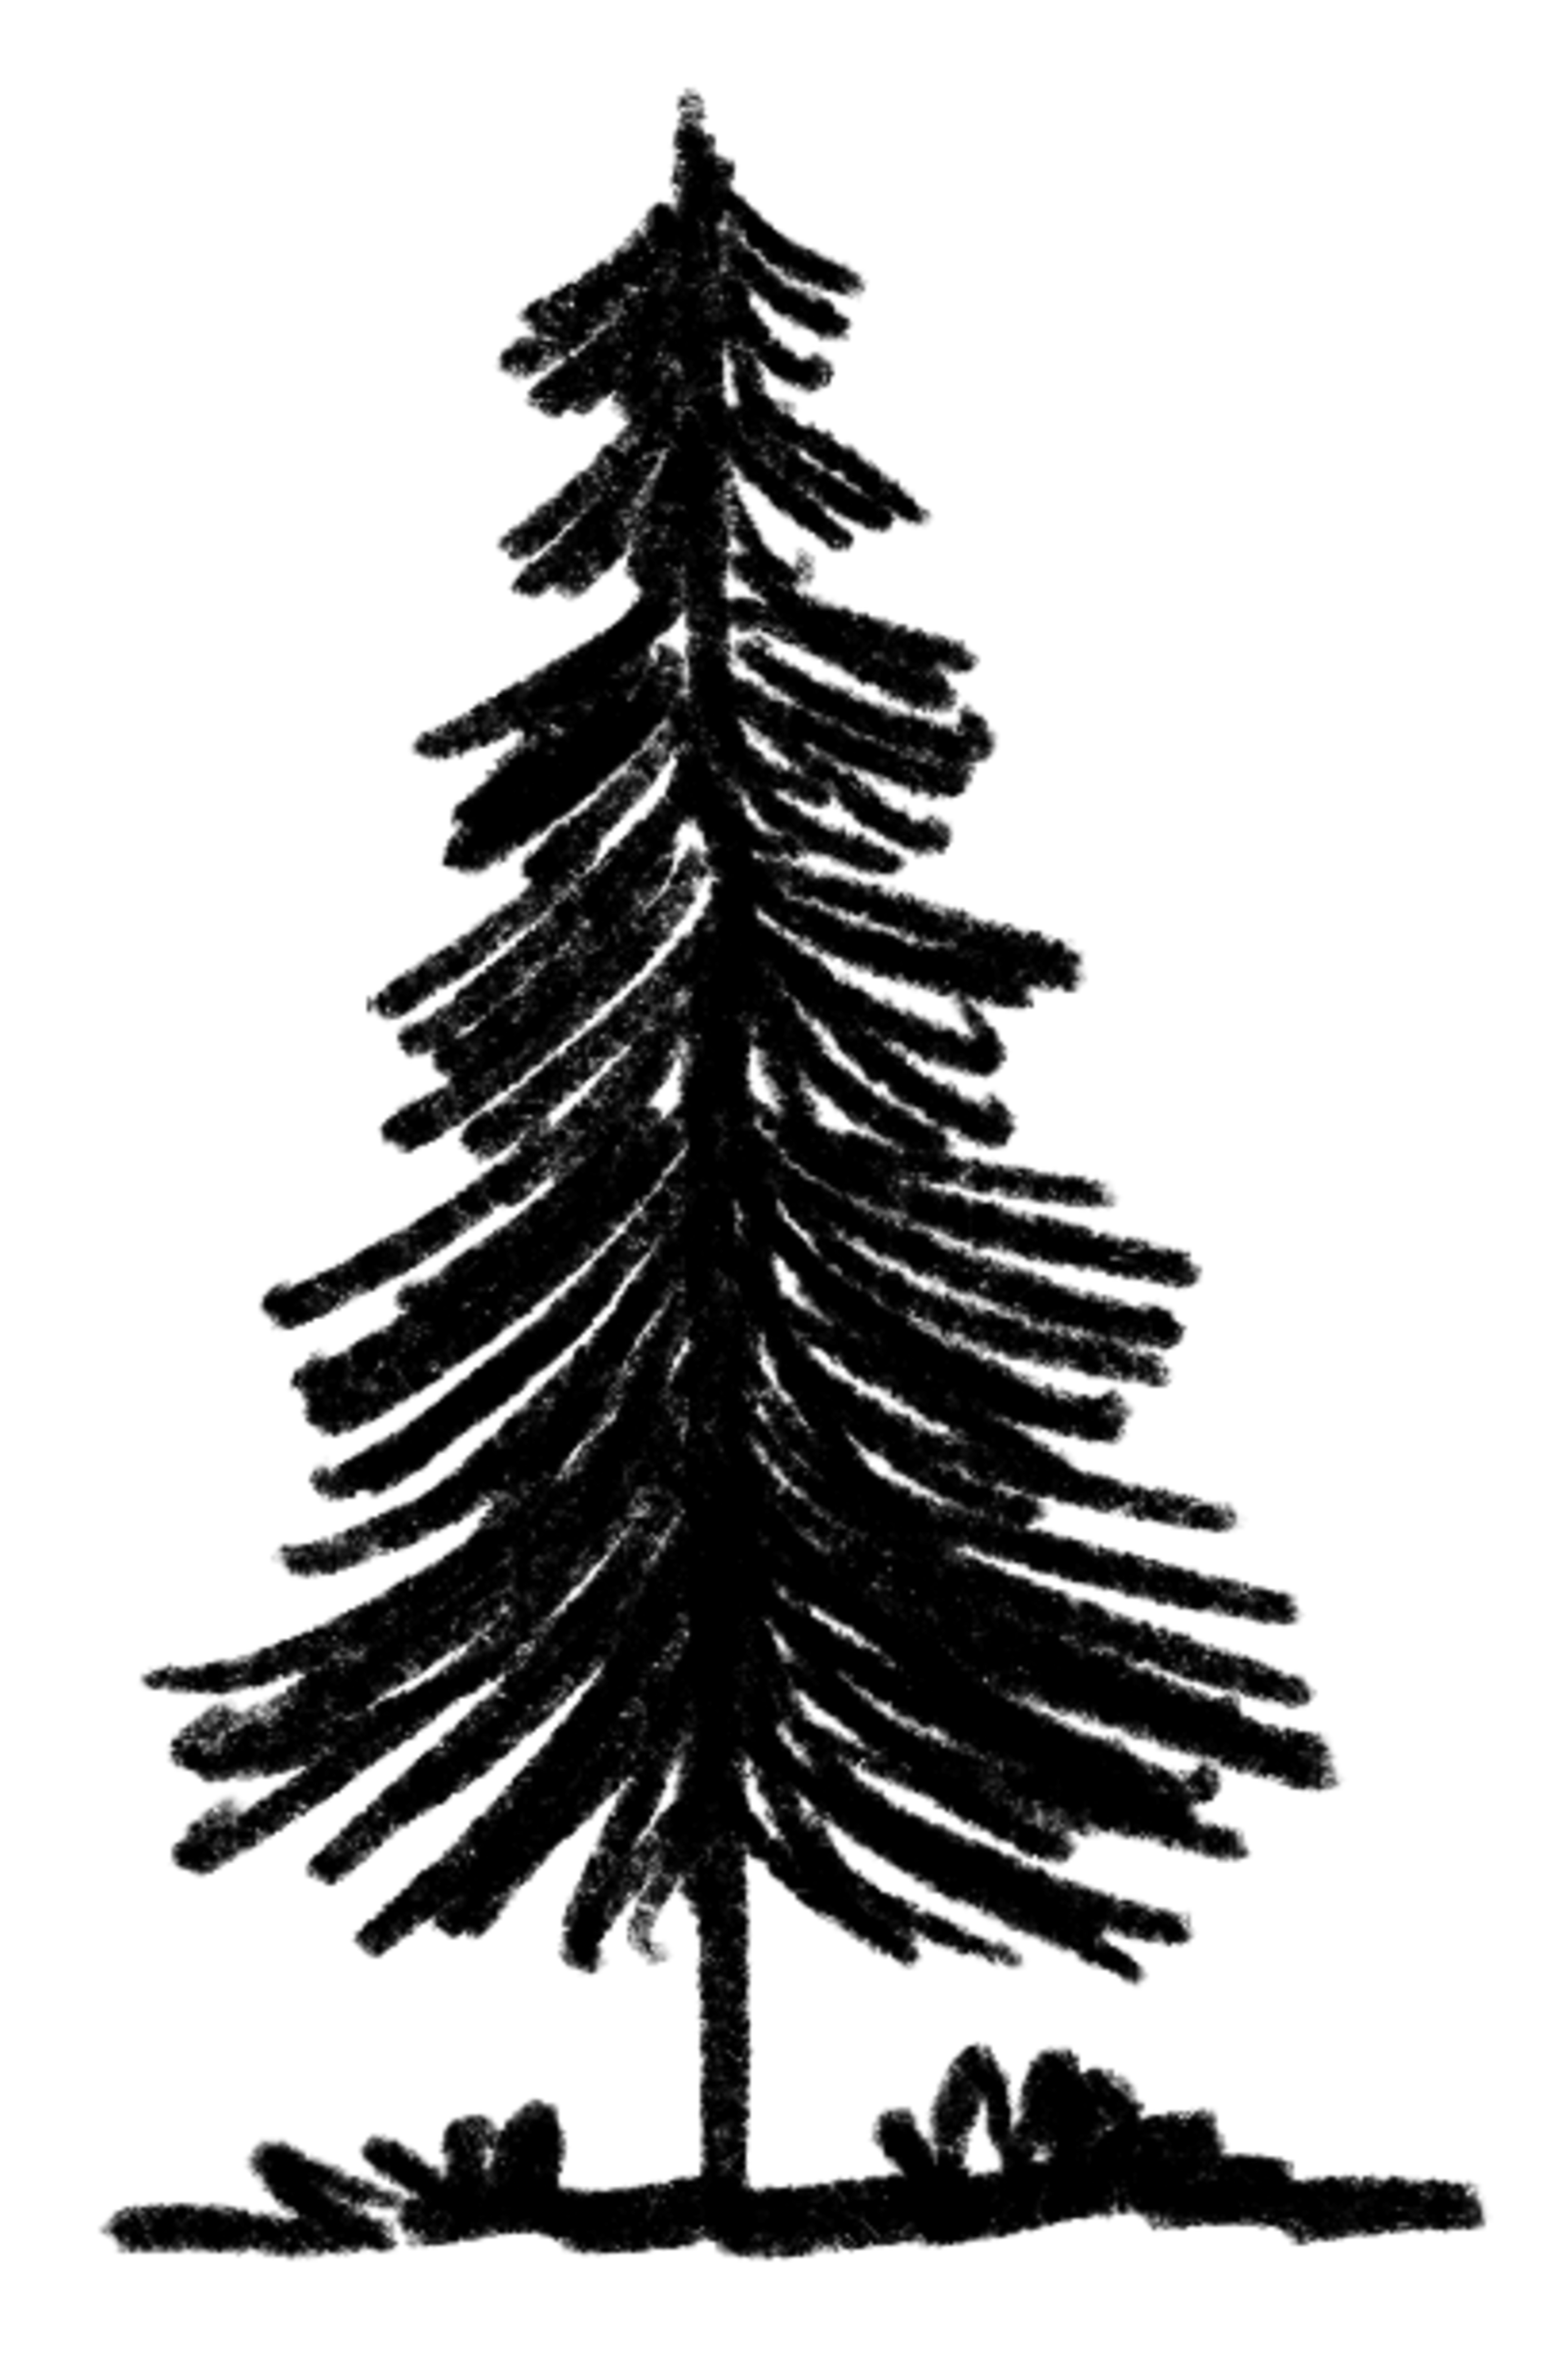 microadventure_illu_tree-2_illustration-clipping